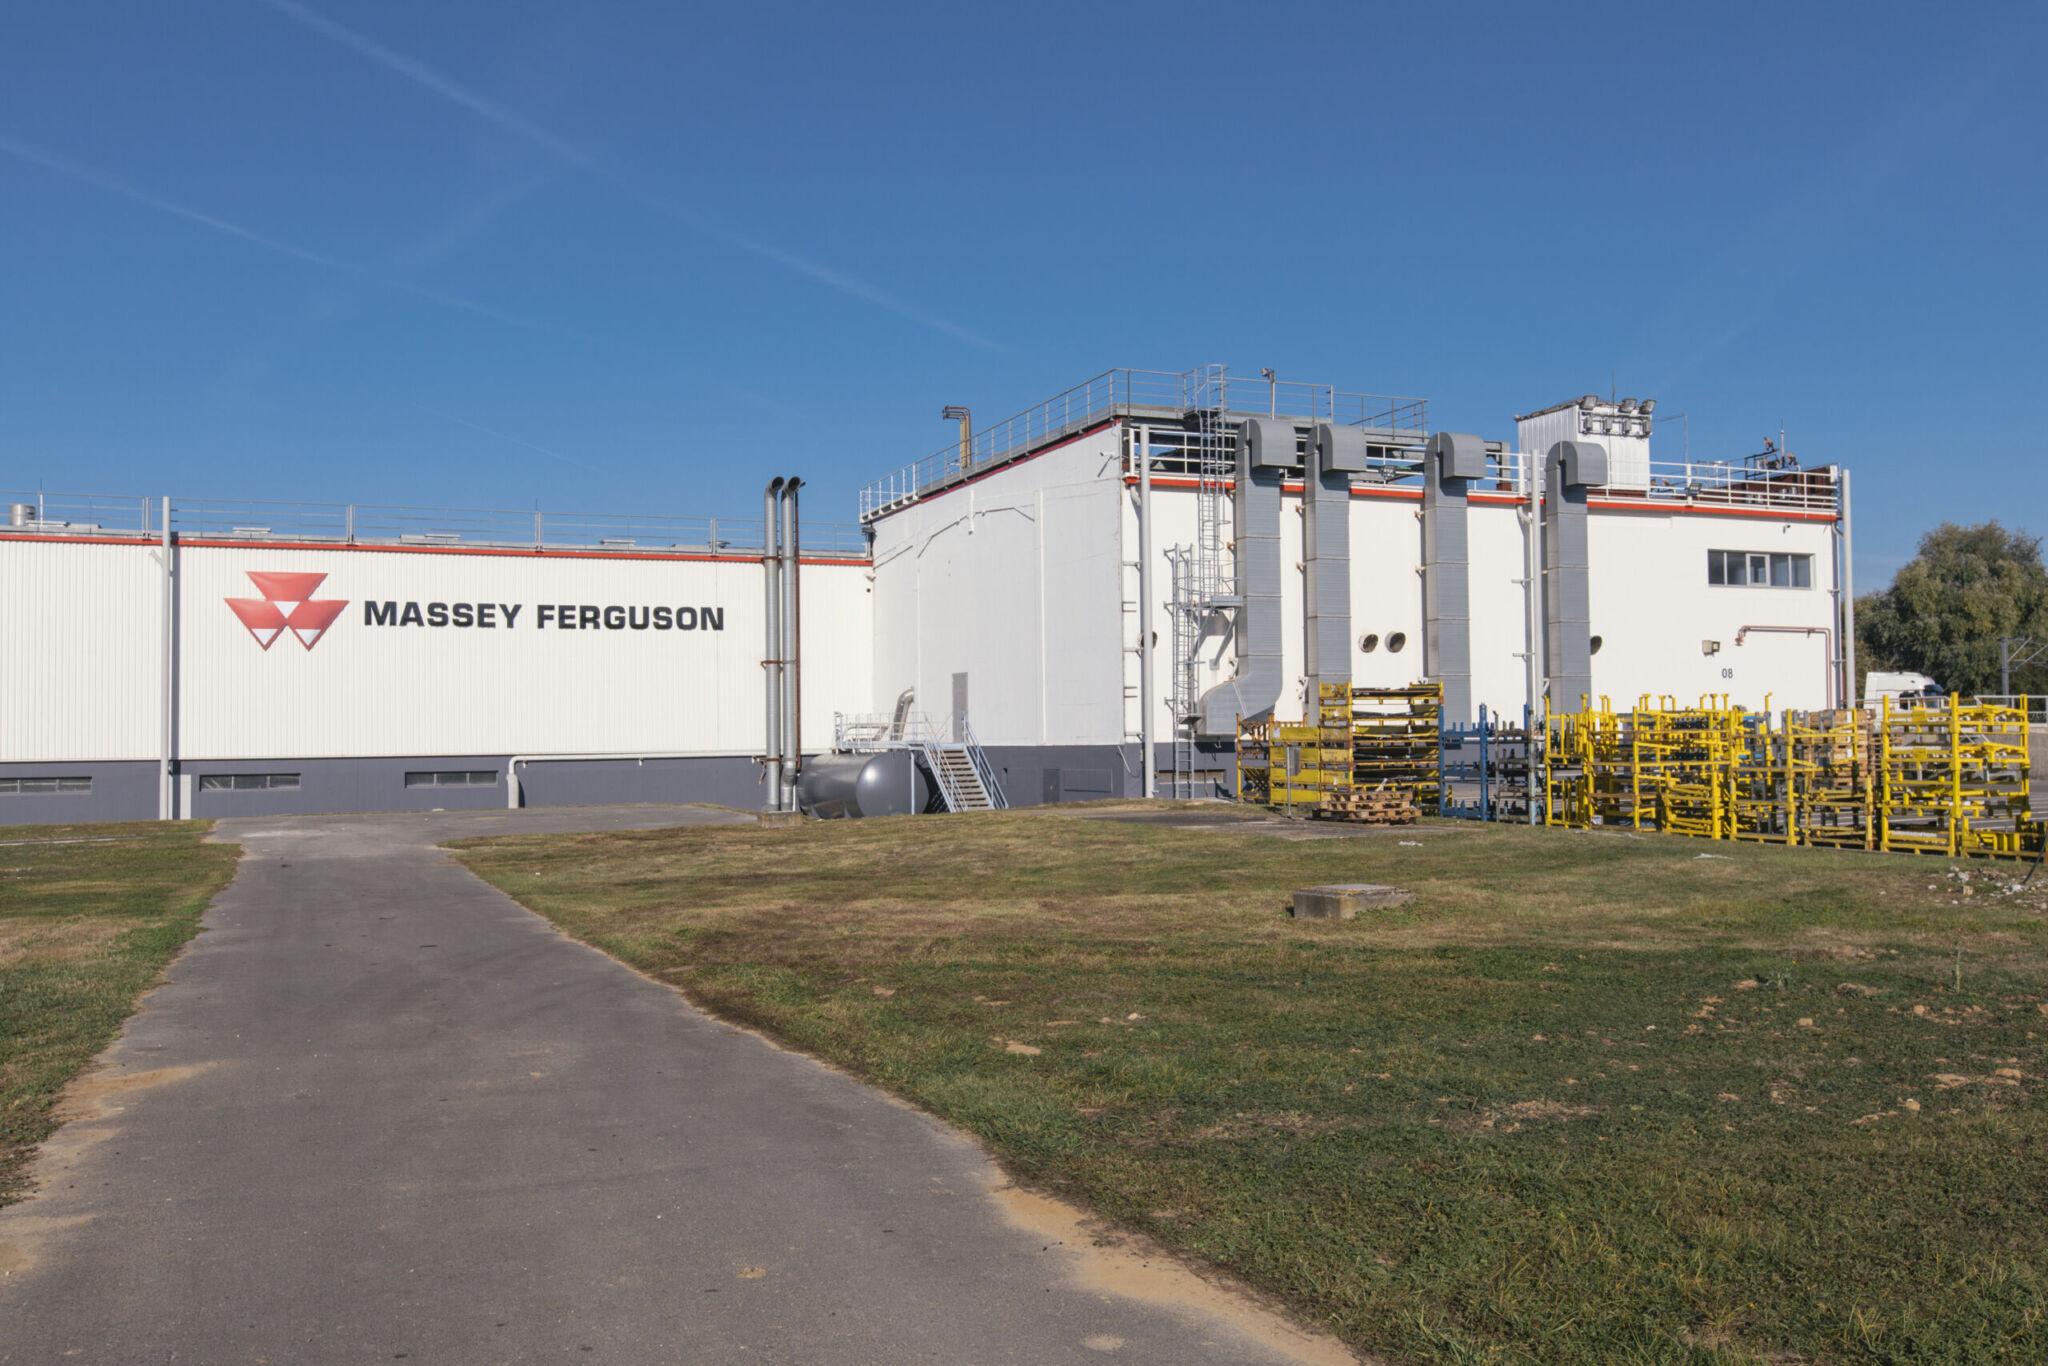 MF_Beauvais|copyright: Massey Ferguson